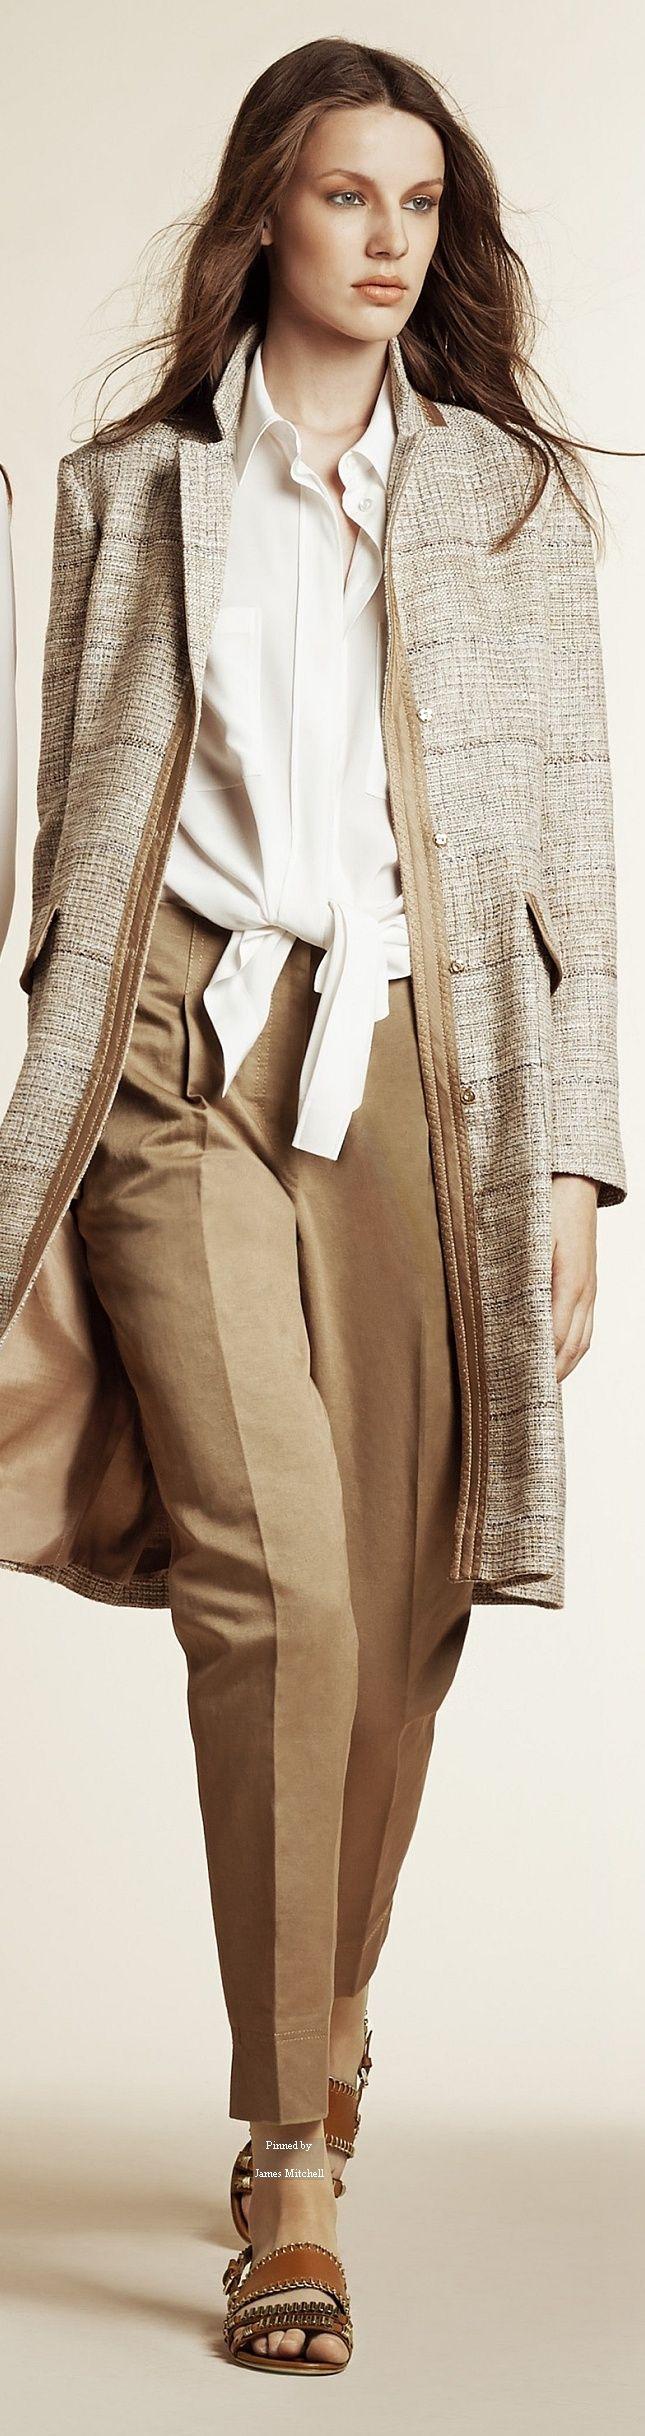 Alberta Ferretti Pre Spring 2016 collection women fashion outfit clothing stylish apparel @roressclothes closet ideas